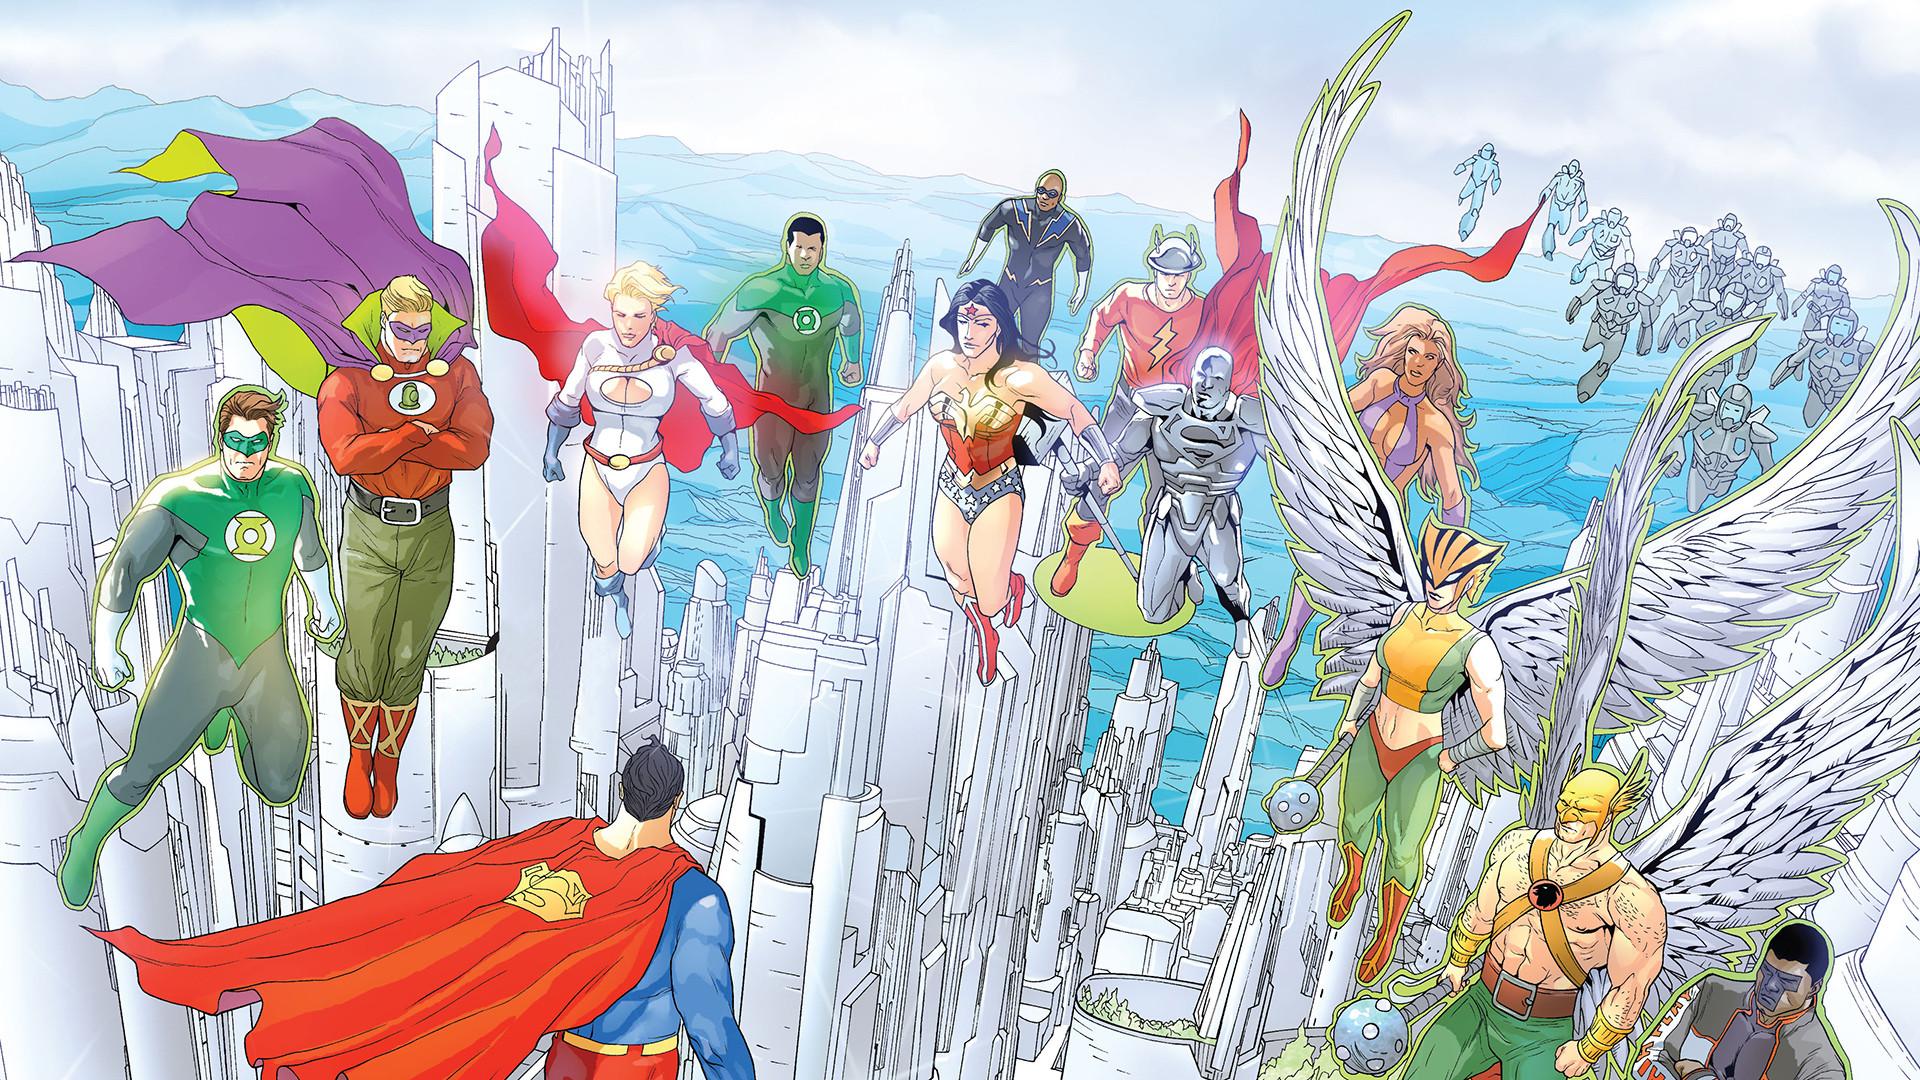 General 1920x1080 DC Comics Justice League Hal Jordan Alan Scott John Stewart Wonder Woman Black Lightning Steel (DC Comics) Jay Garrick Starfire (DC Comics) Hawkgirl Hawkman Mister Terrific Power Girl Green Lantern The Flash Superman